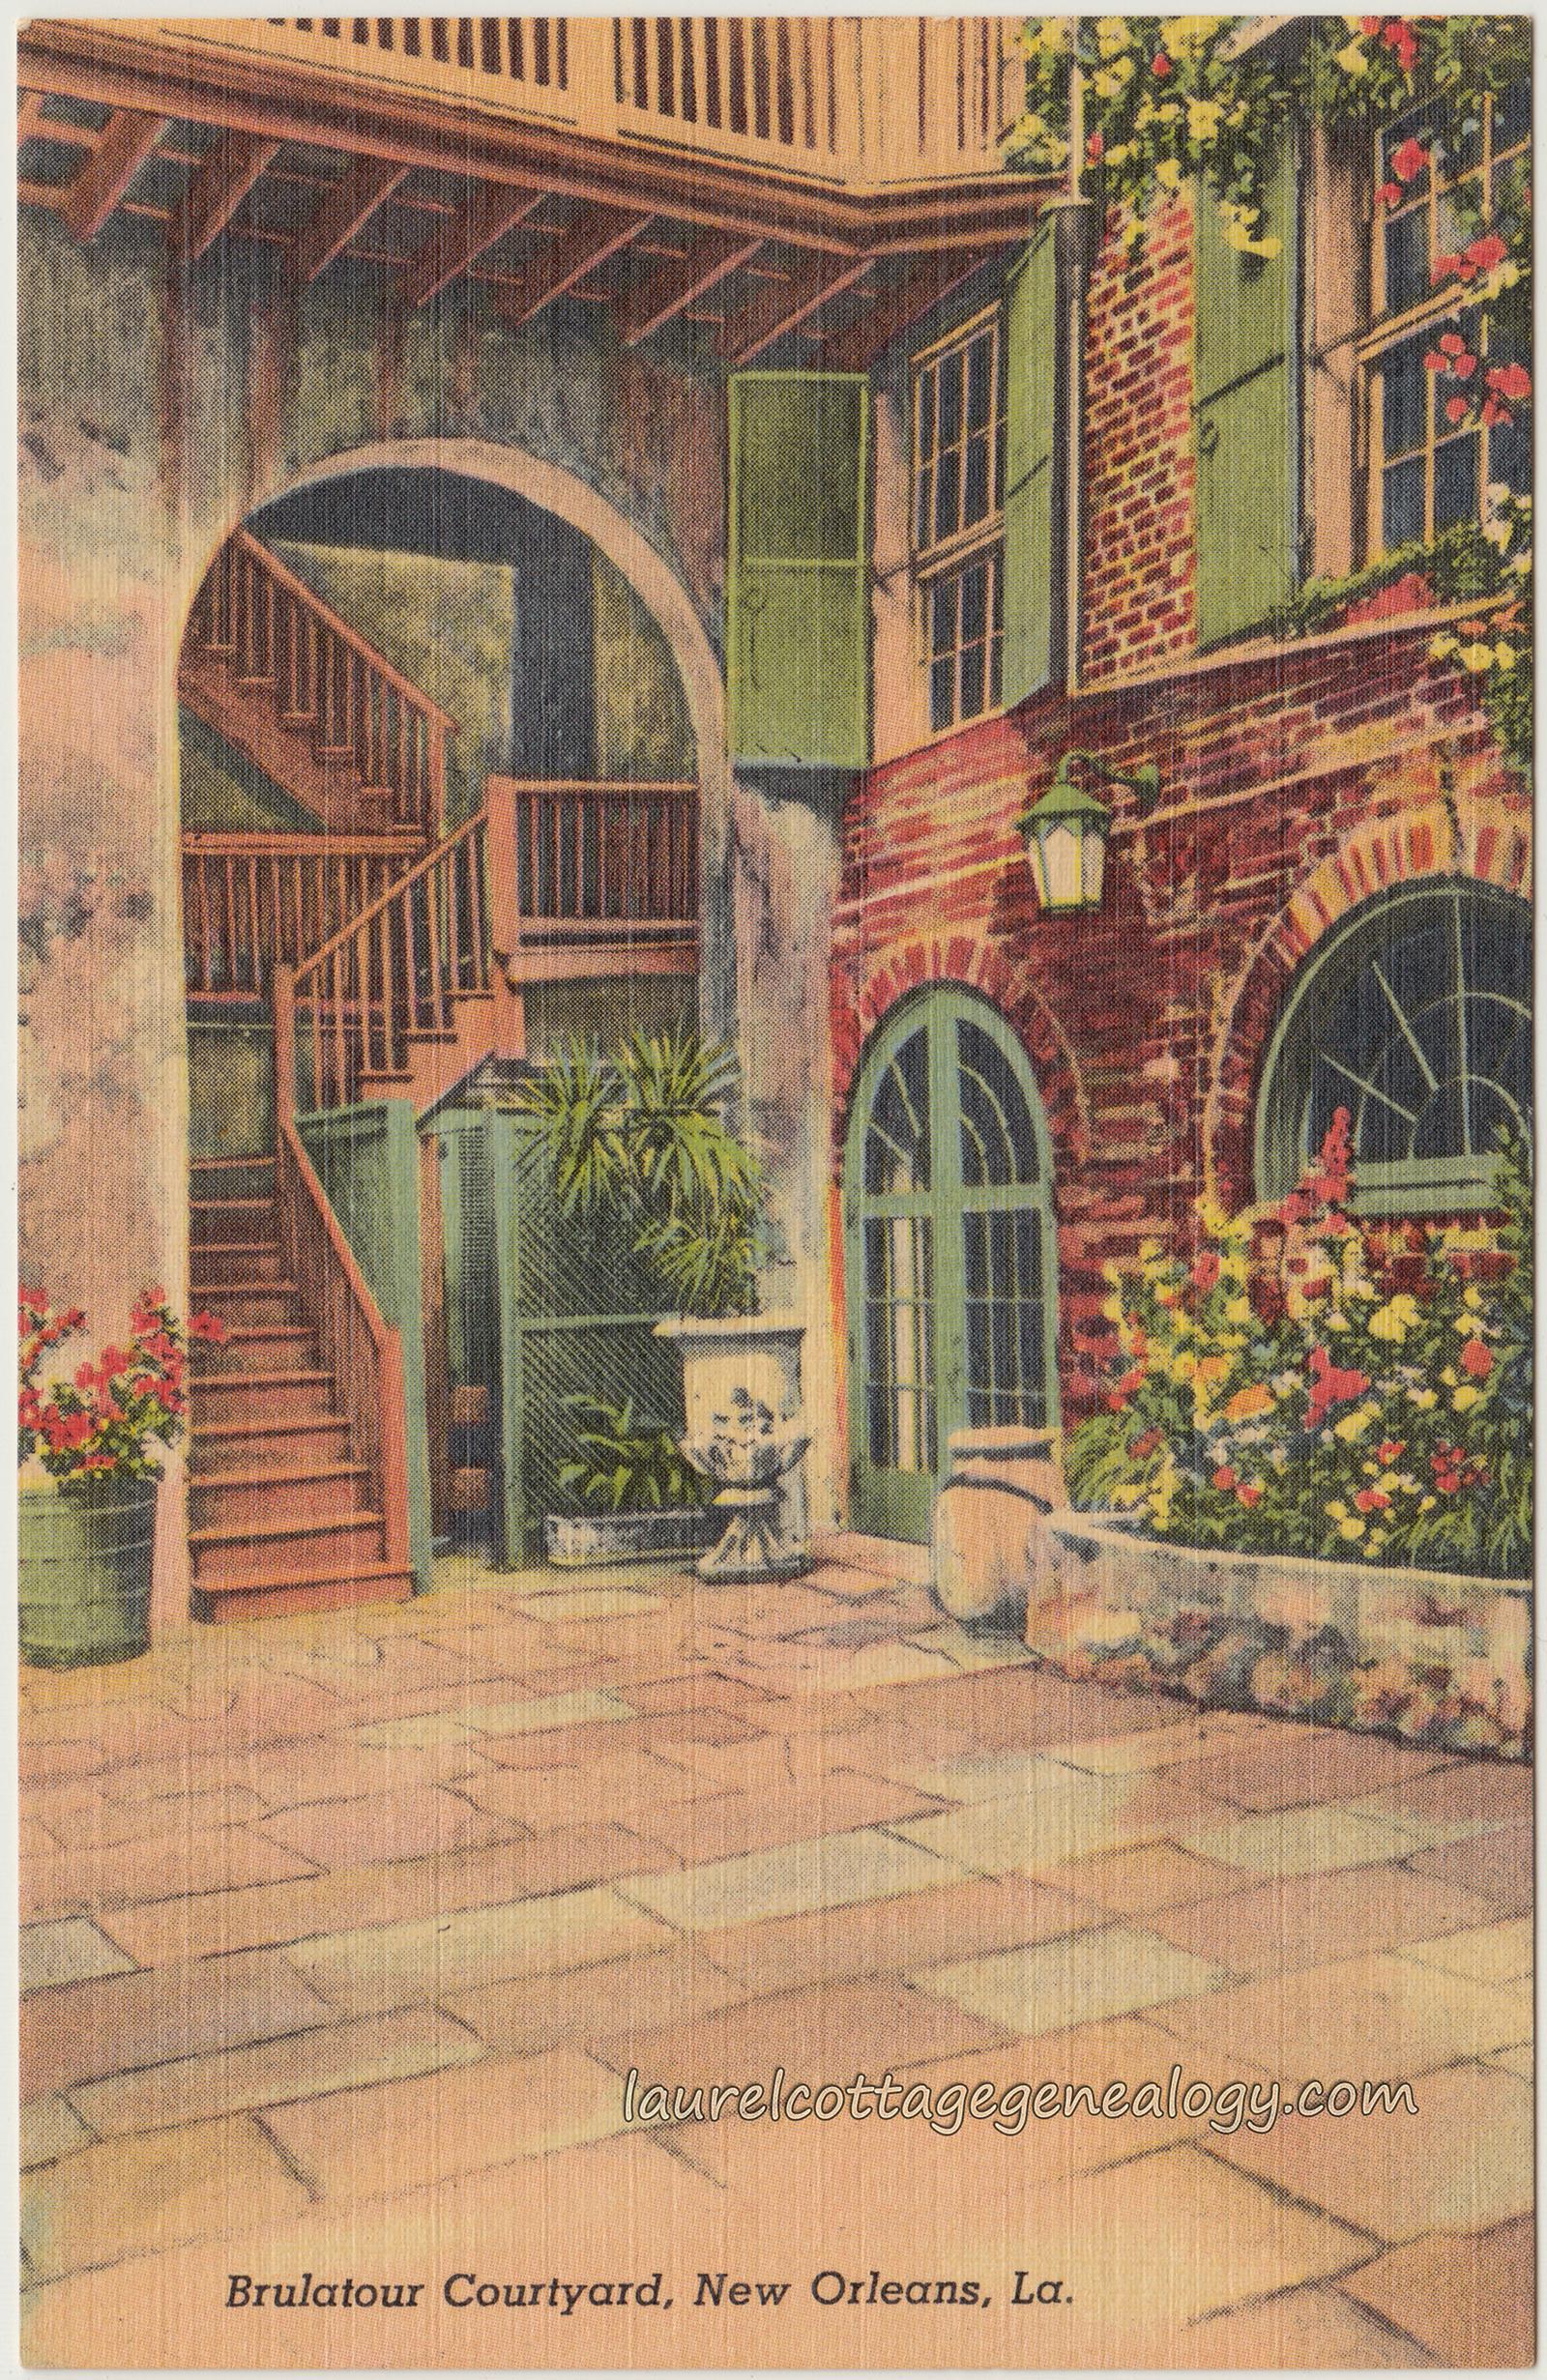 Brulatour Courtyard New Orleans Louisiana Laurel